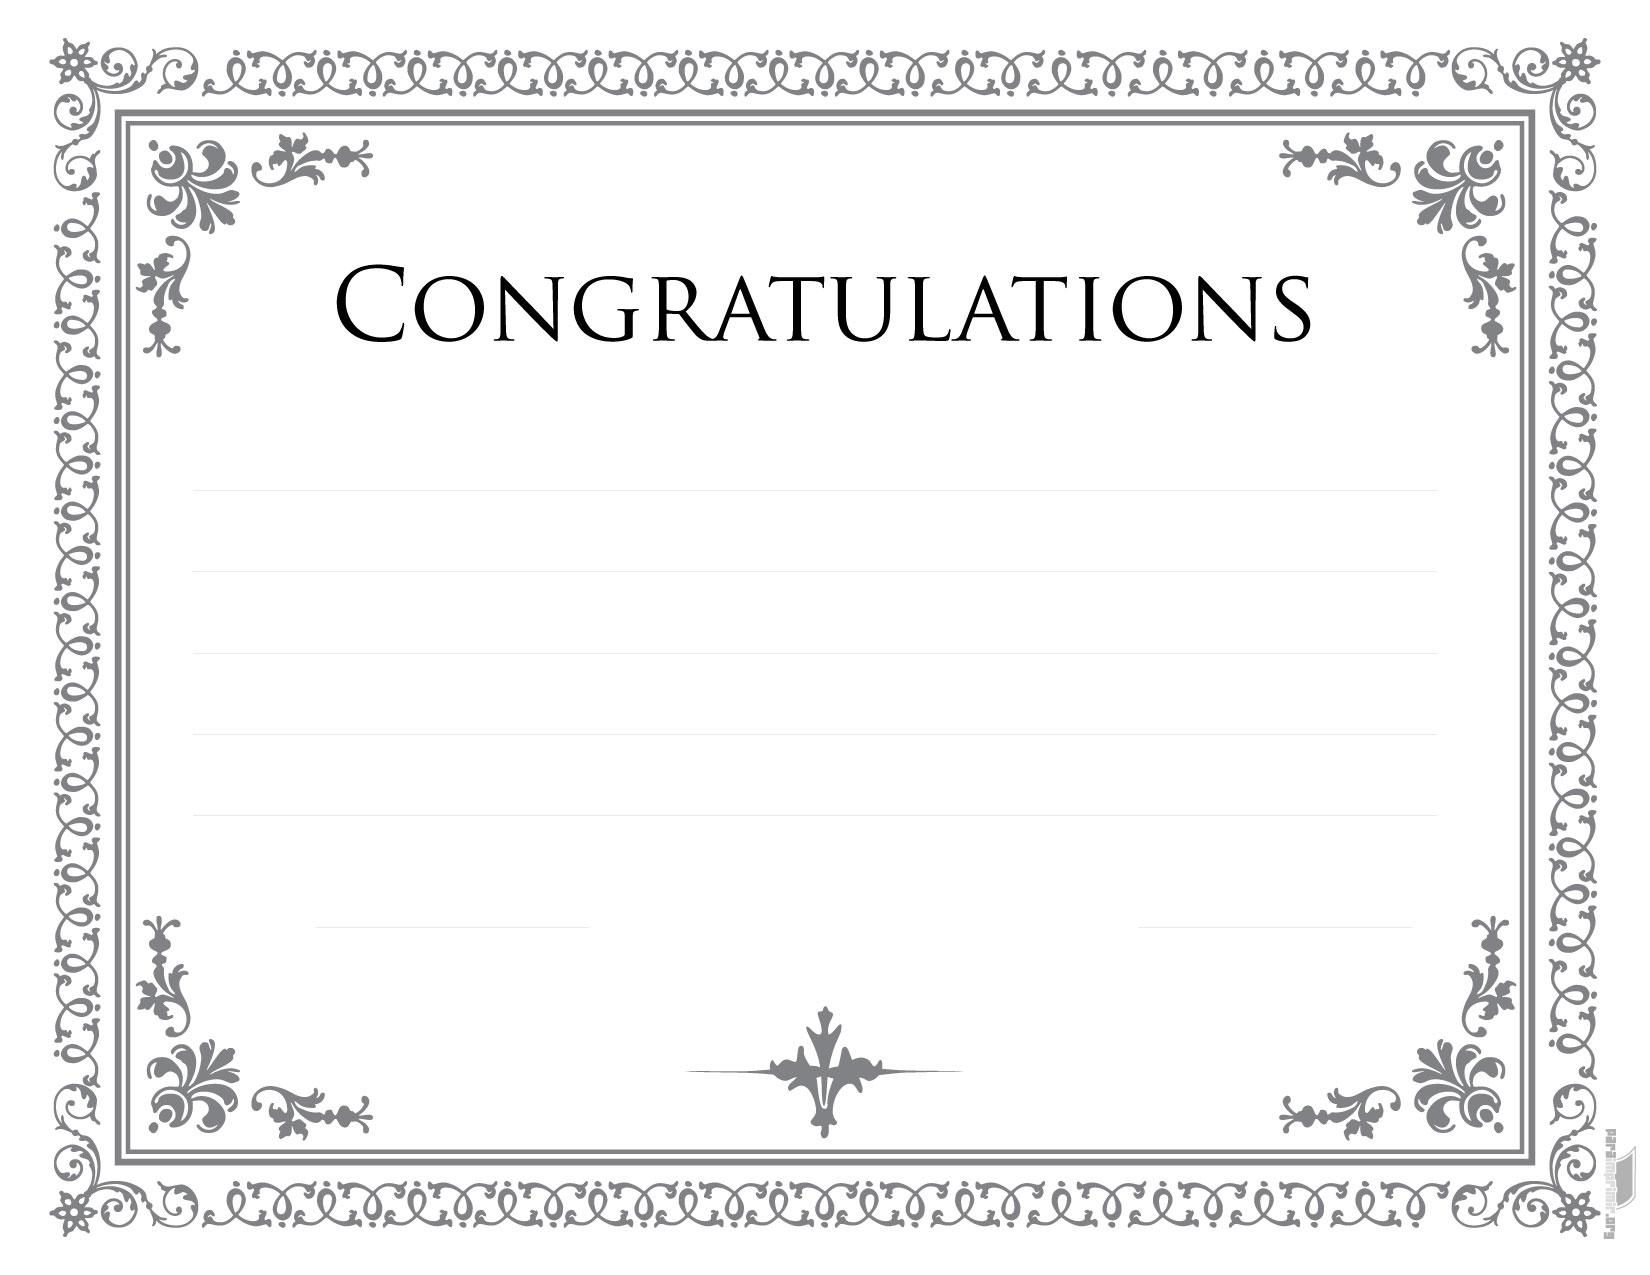 Diploma de congratulations para imprimir